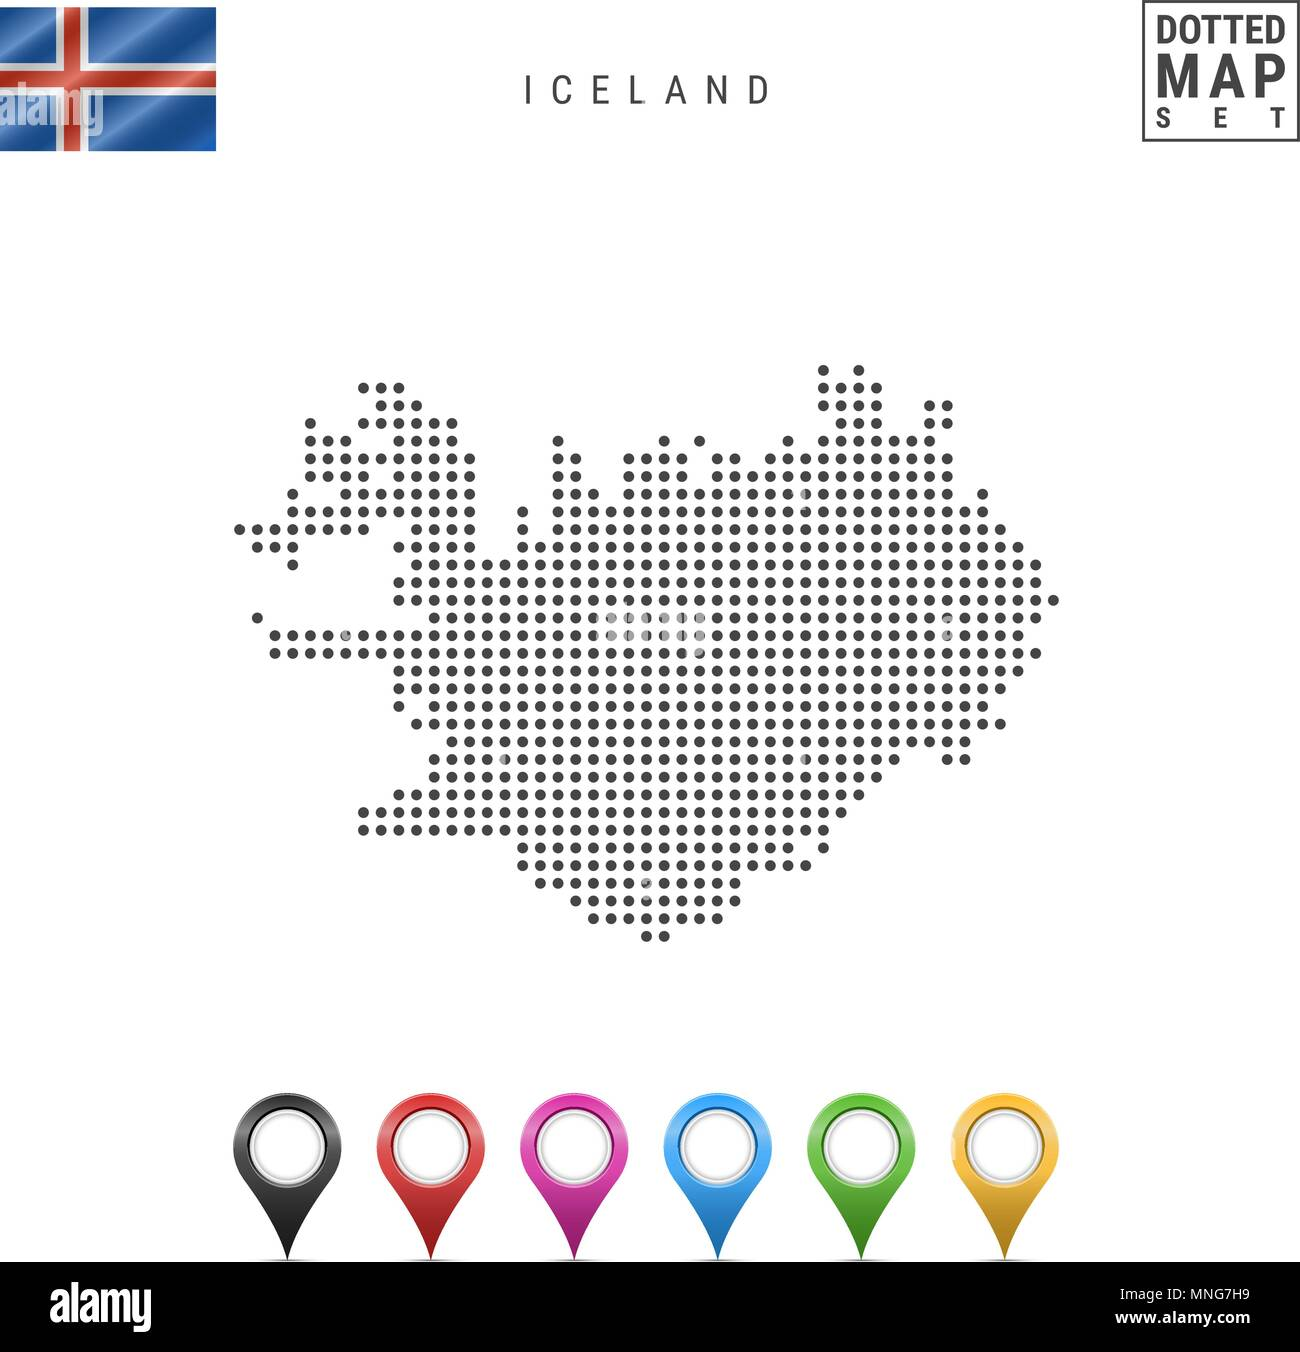 Iceland Map Vector Stockfotos & Iceland Map Vector Bilder - Alamy